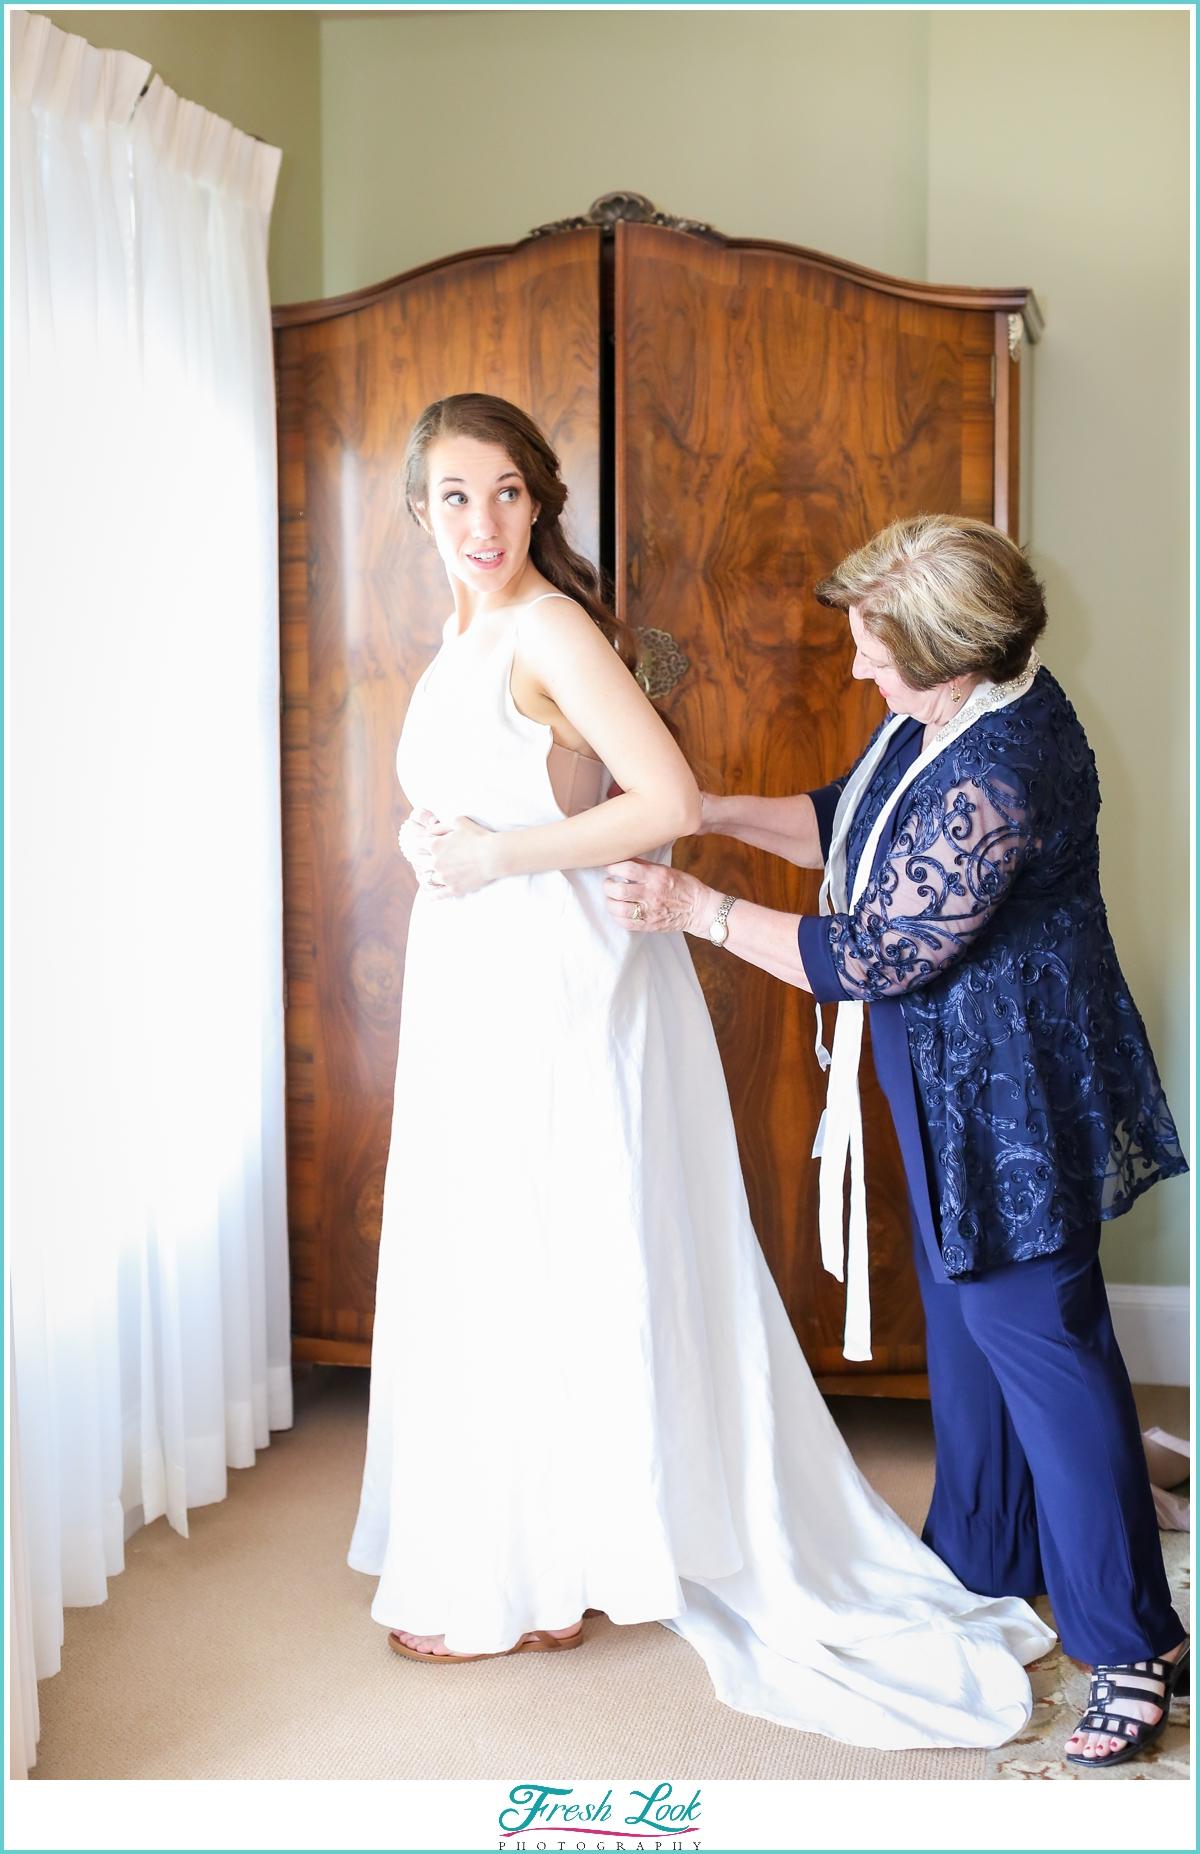 mom helping bride with wedding dress